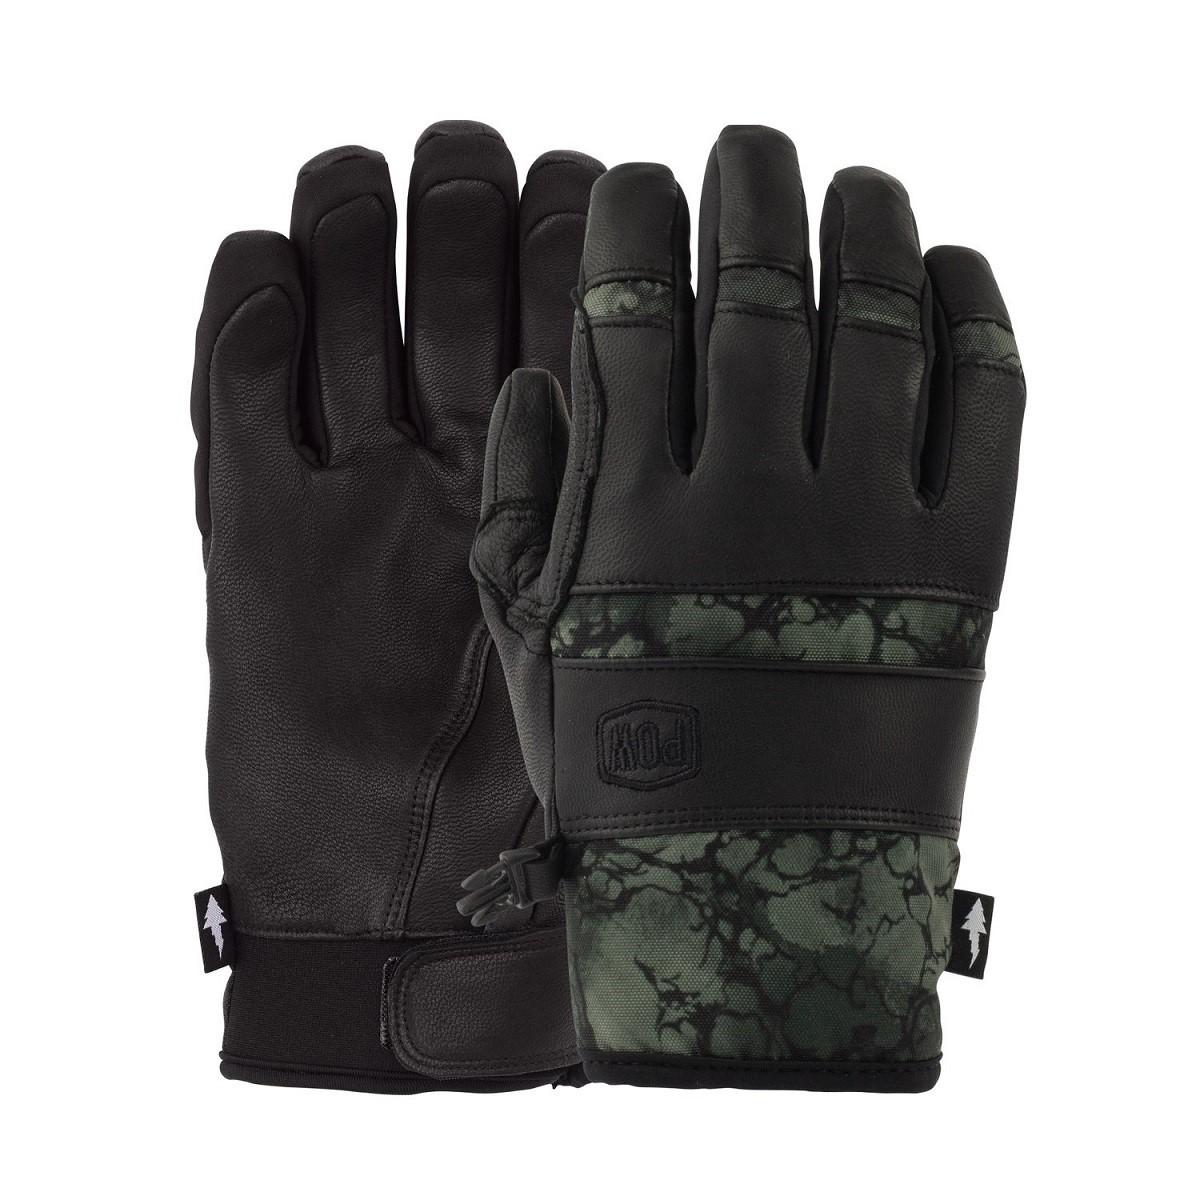 POW Villain Glove